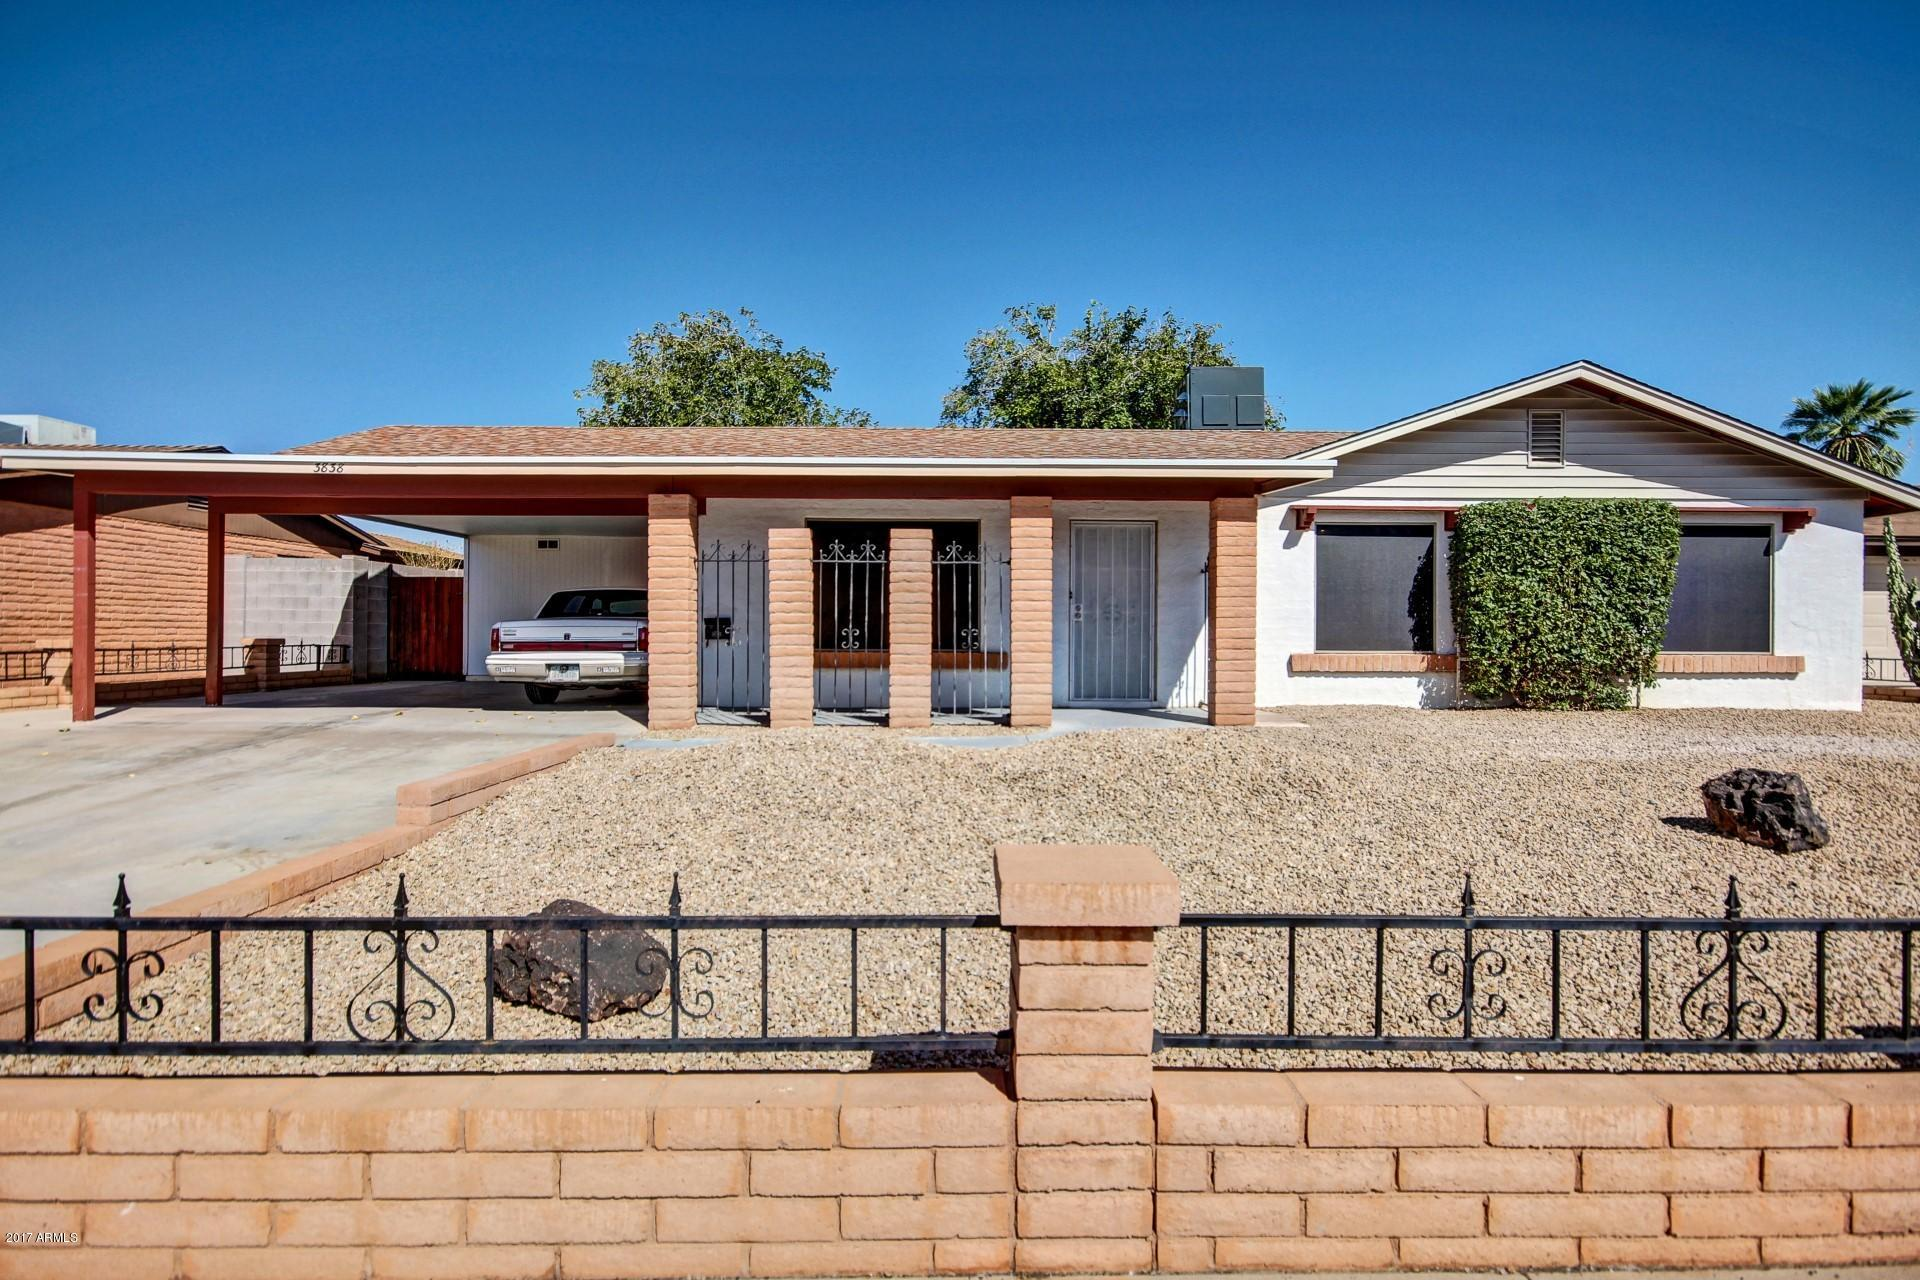 Phoenix Homes For Sale With No HOA AZ Homes For Sale with No HOA